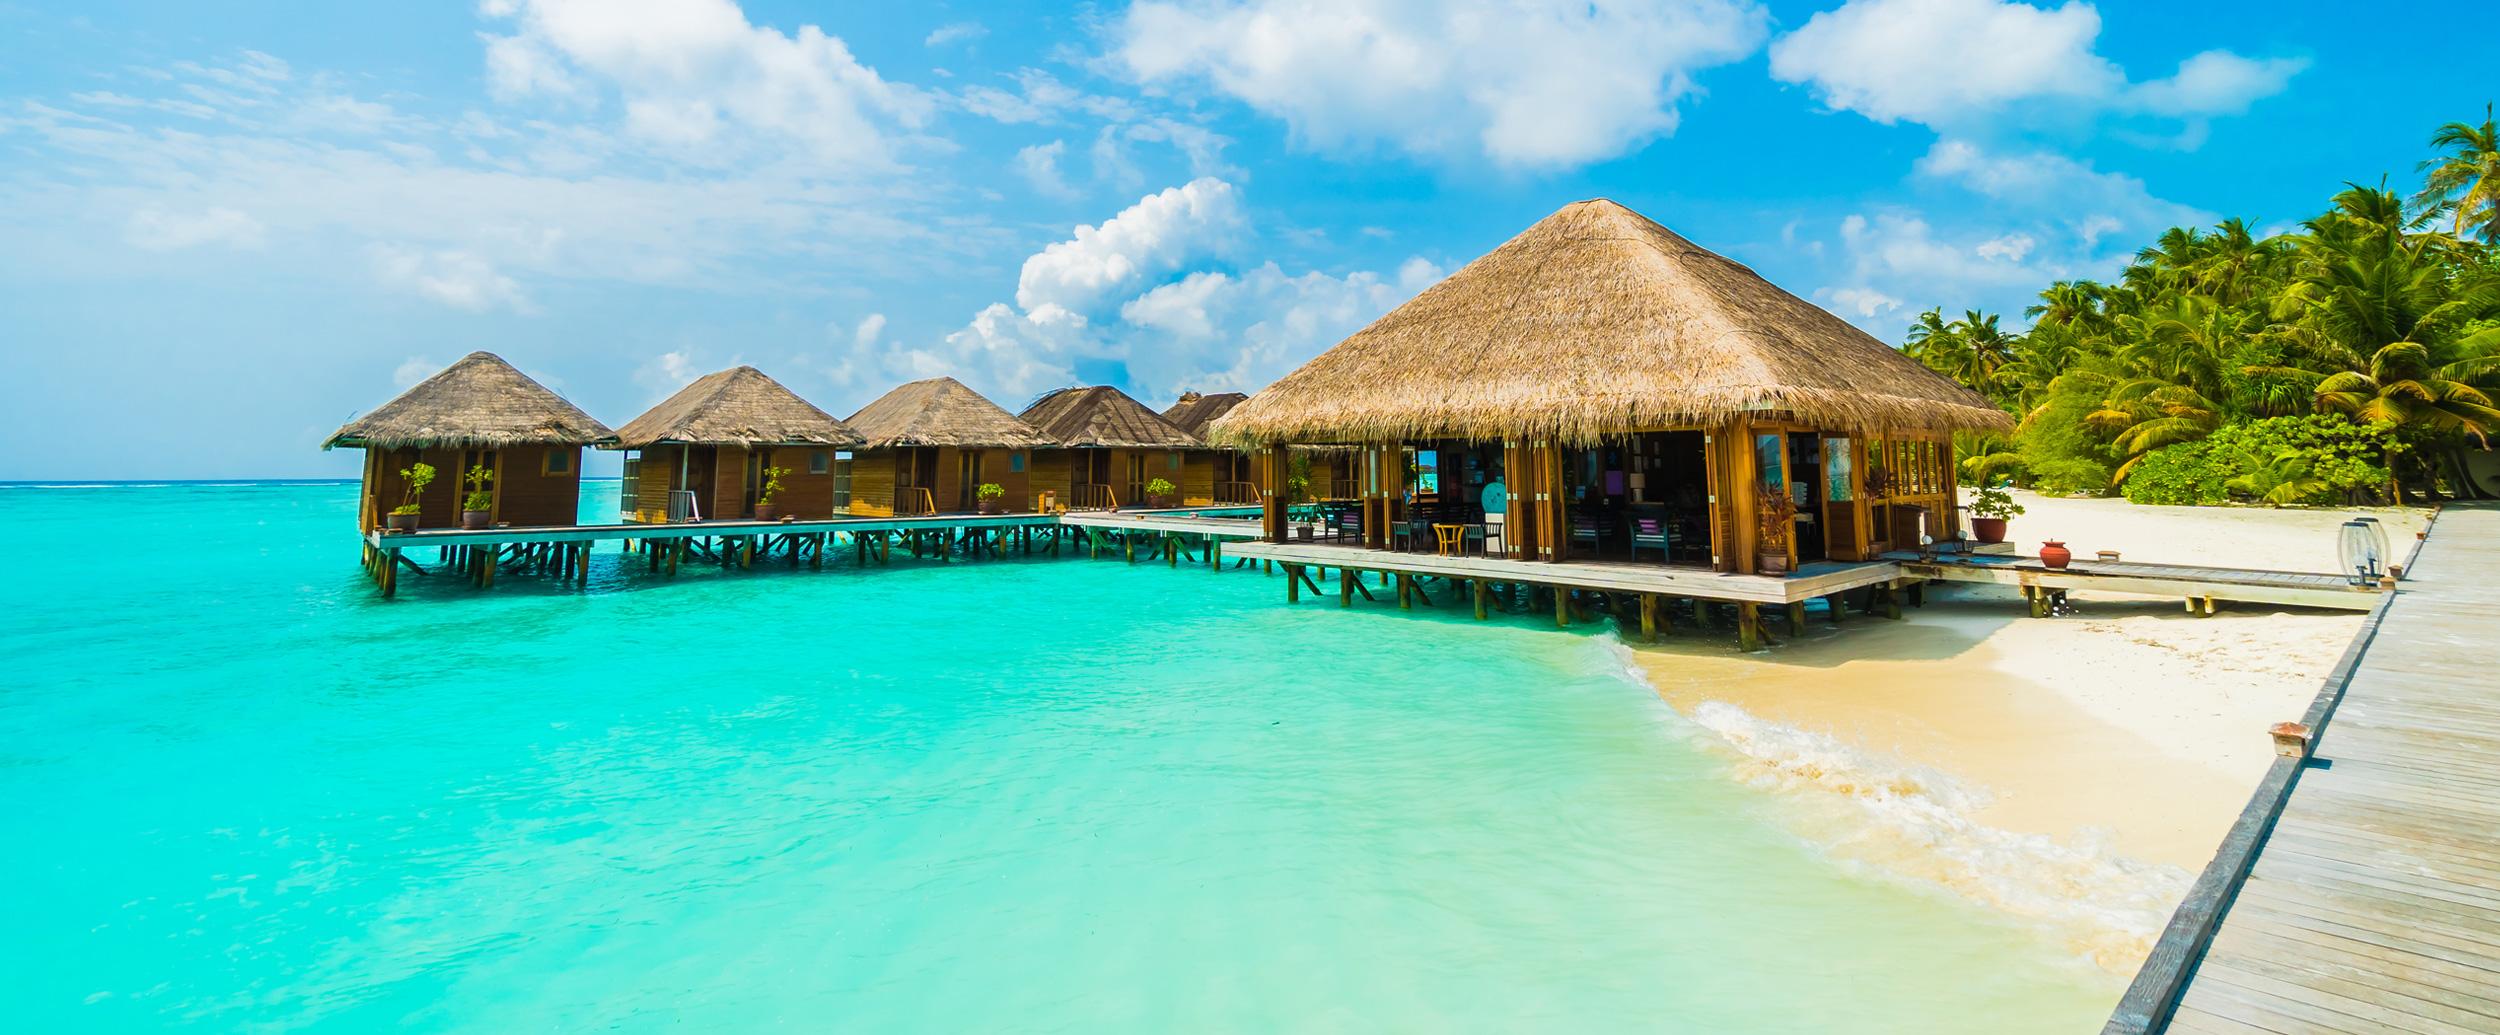 Hotel conrad maldives rangali island 5 ari atoll for Hotel conrad maldivas islas rangali